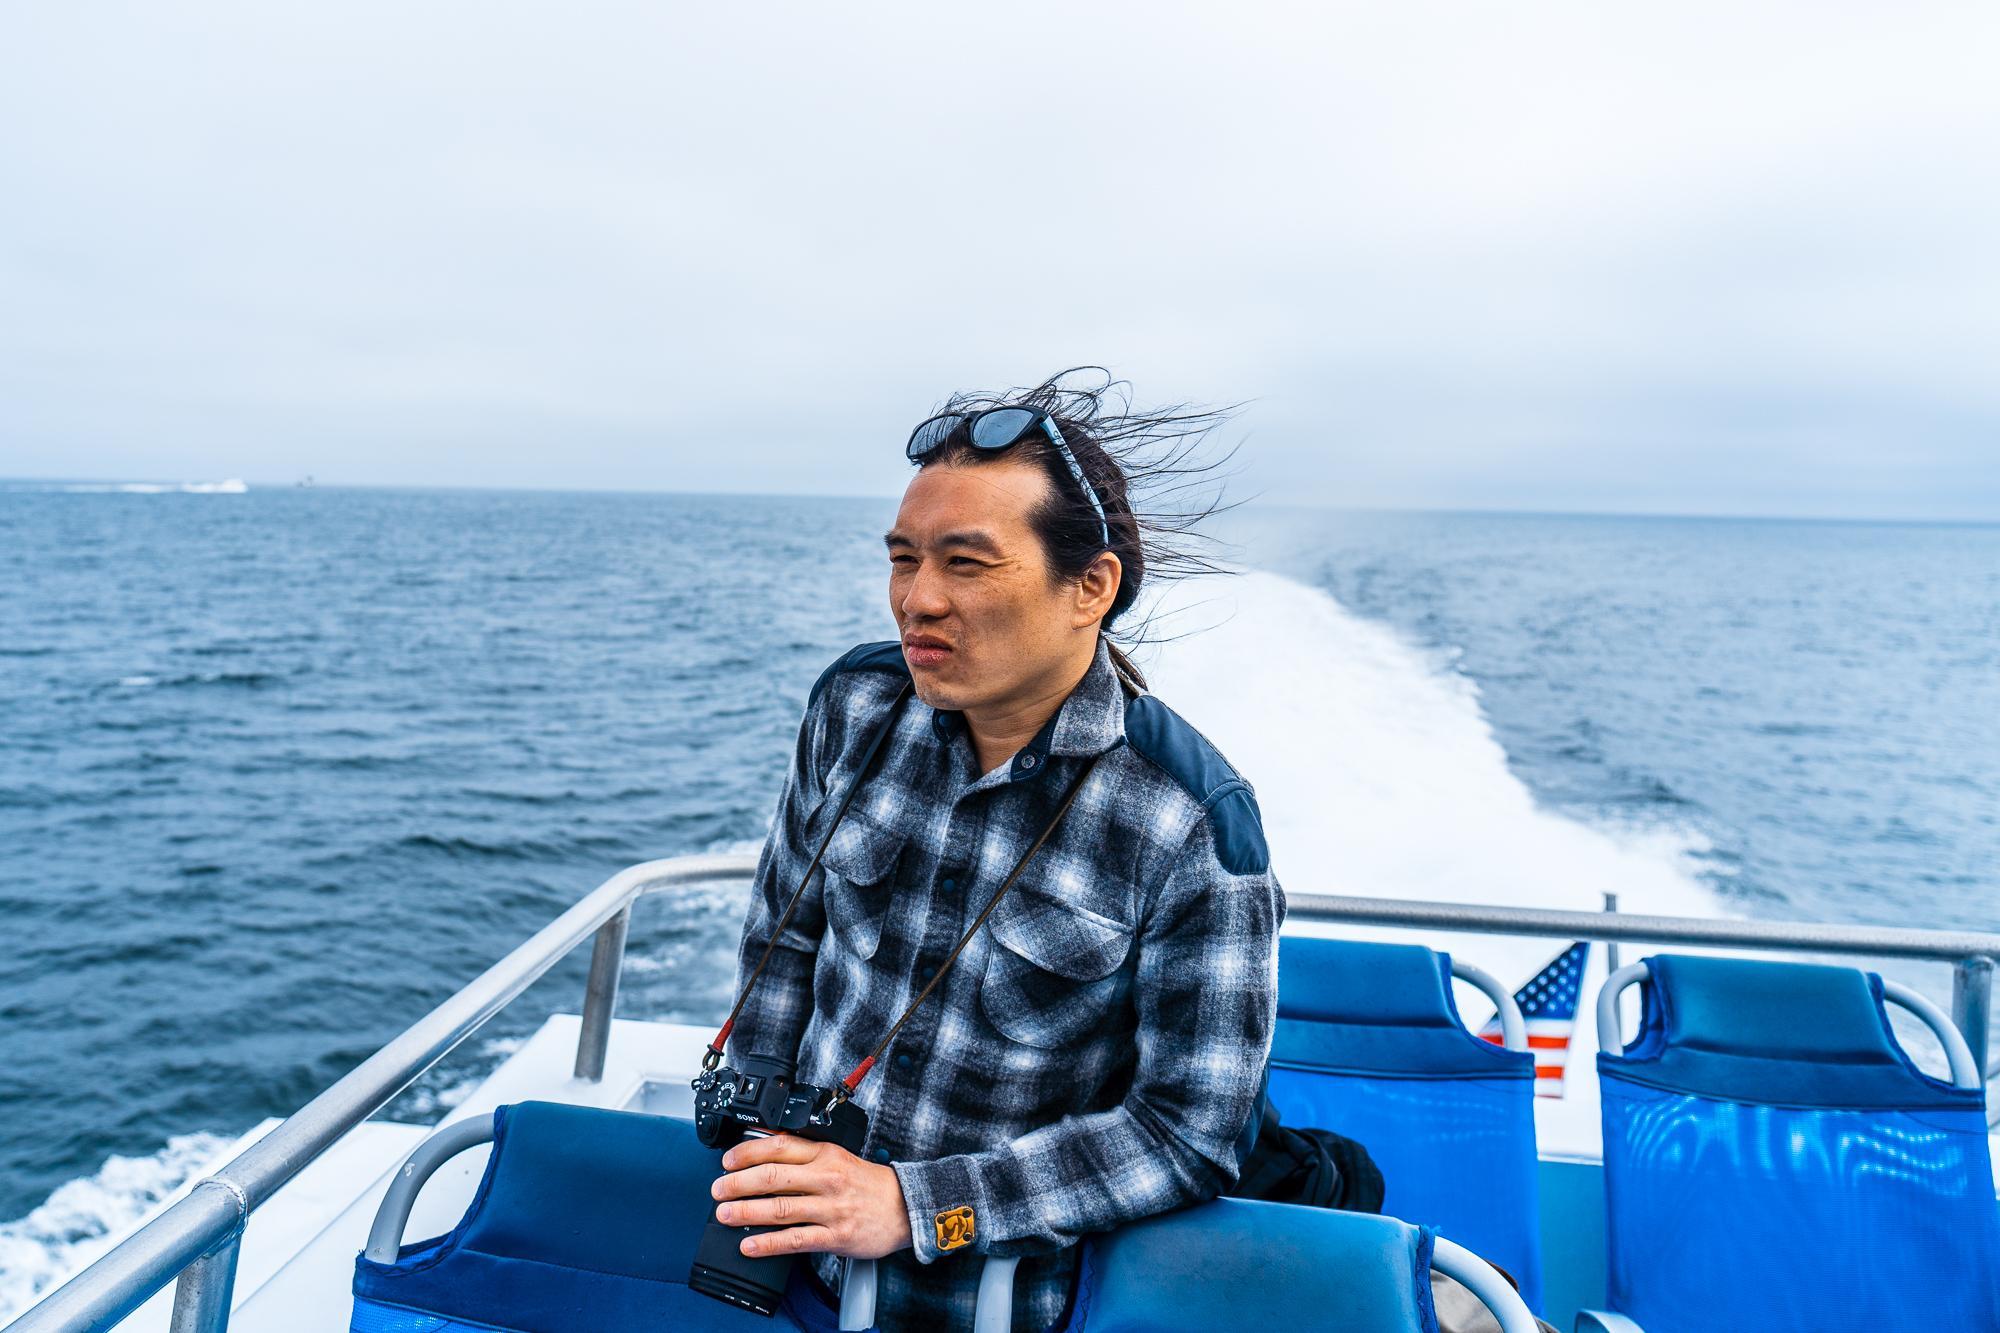 Alex taking in the ocean views